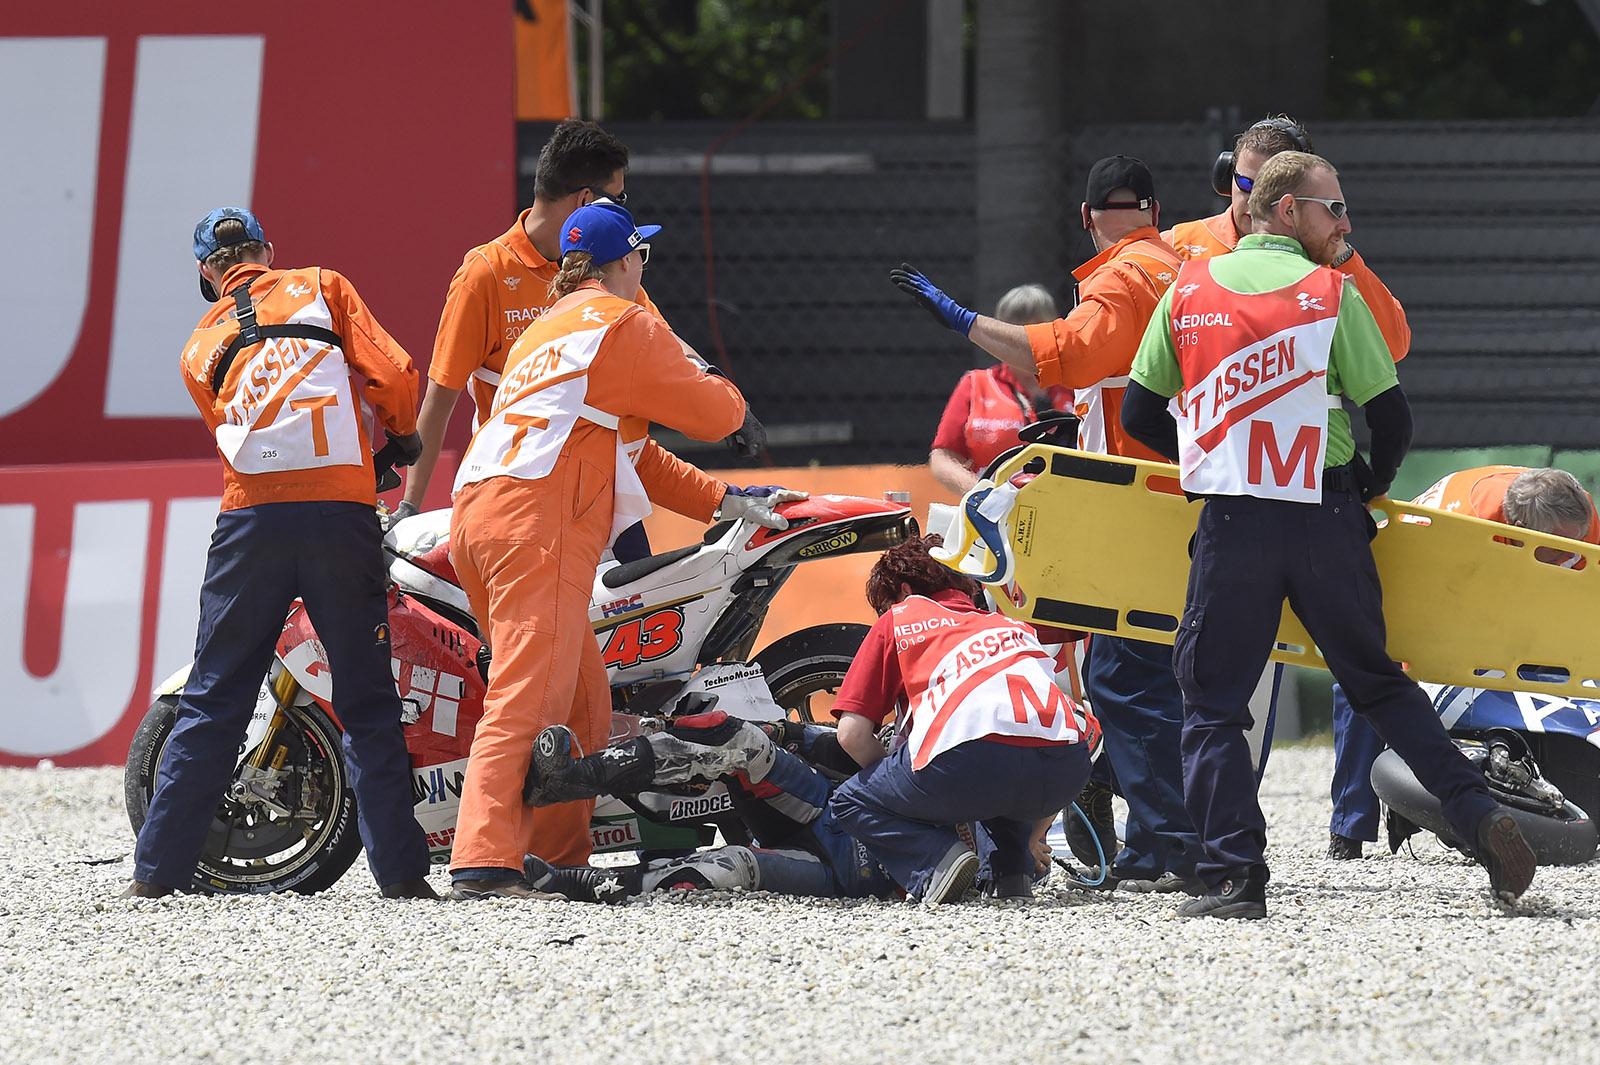 Инцидент Миллер-Барбера (Ассен, 2015)